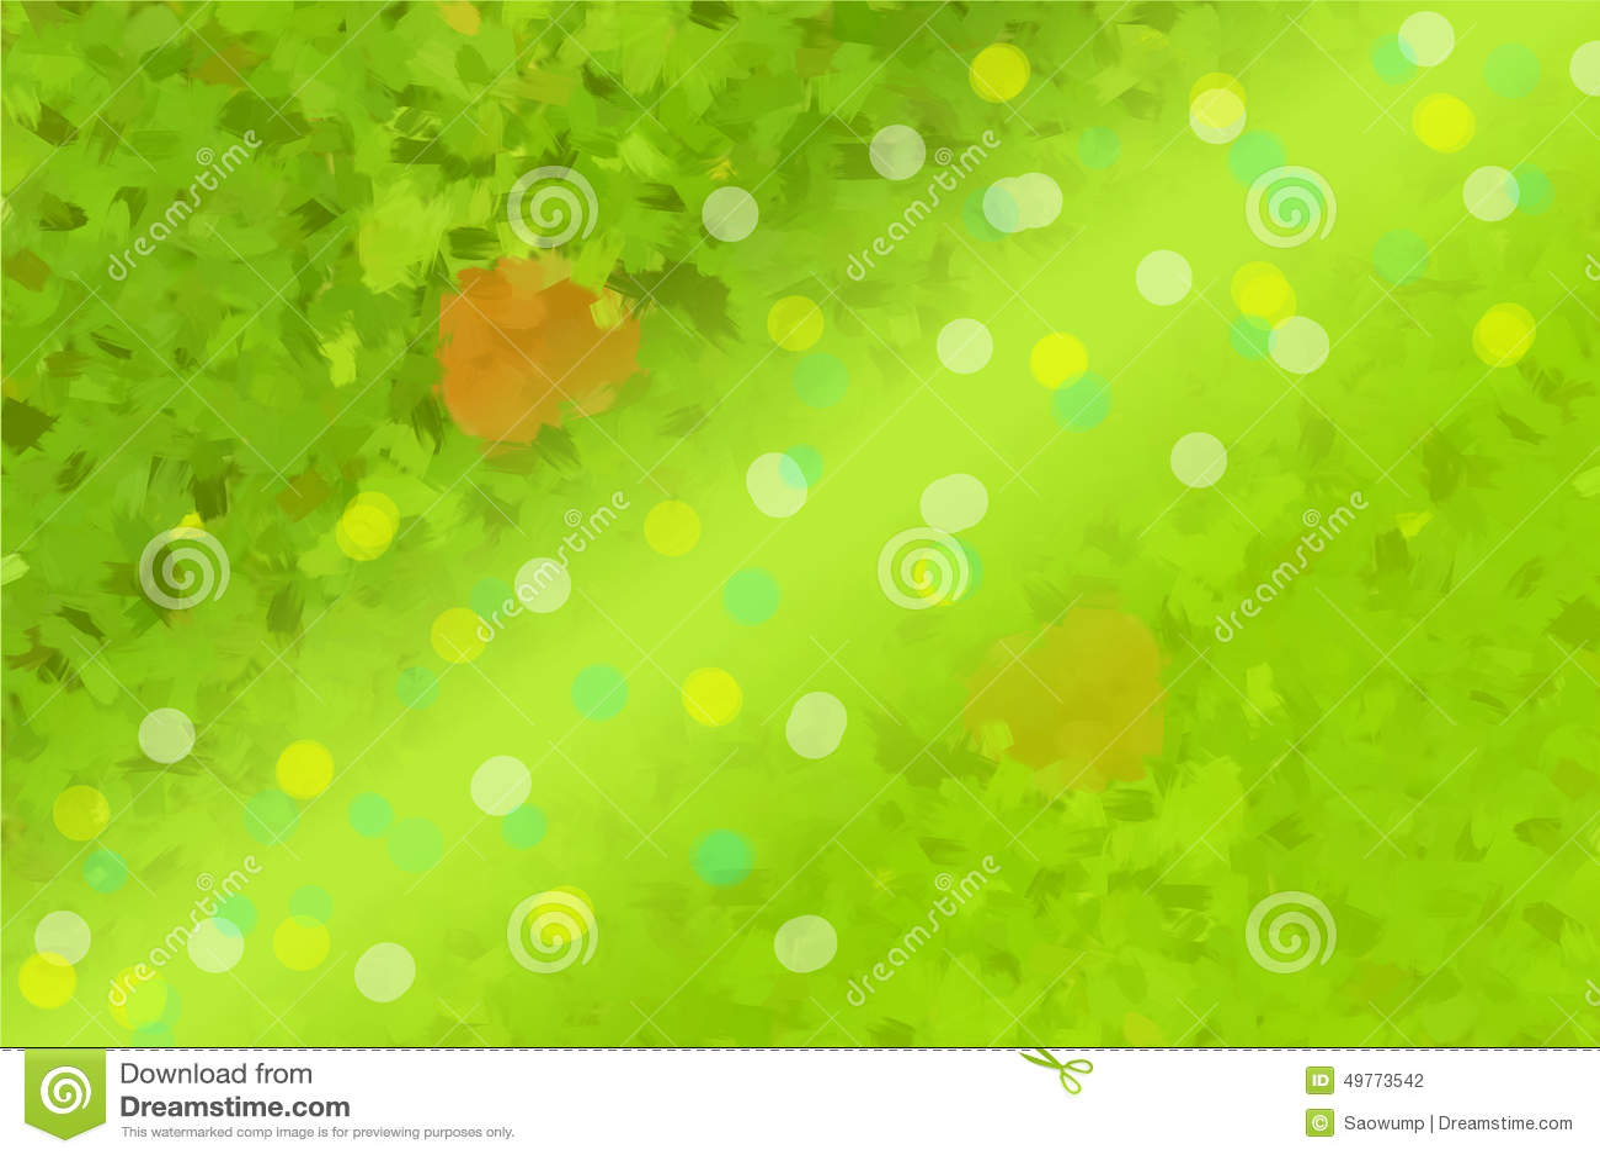 Most Inspiring Wallpaper Love Green - love-garden-bokeh-green-blur-background-design-color-shining-dot-wallpaper-red-blue-white-texture-49773542  Perfect Image Reference_621583.jpg